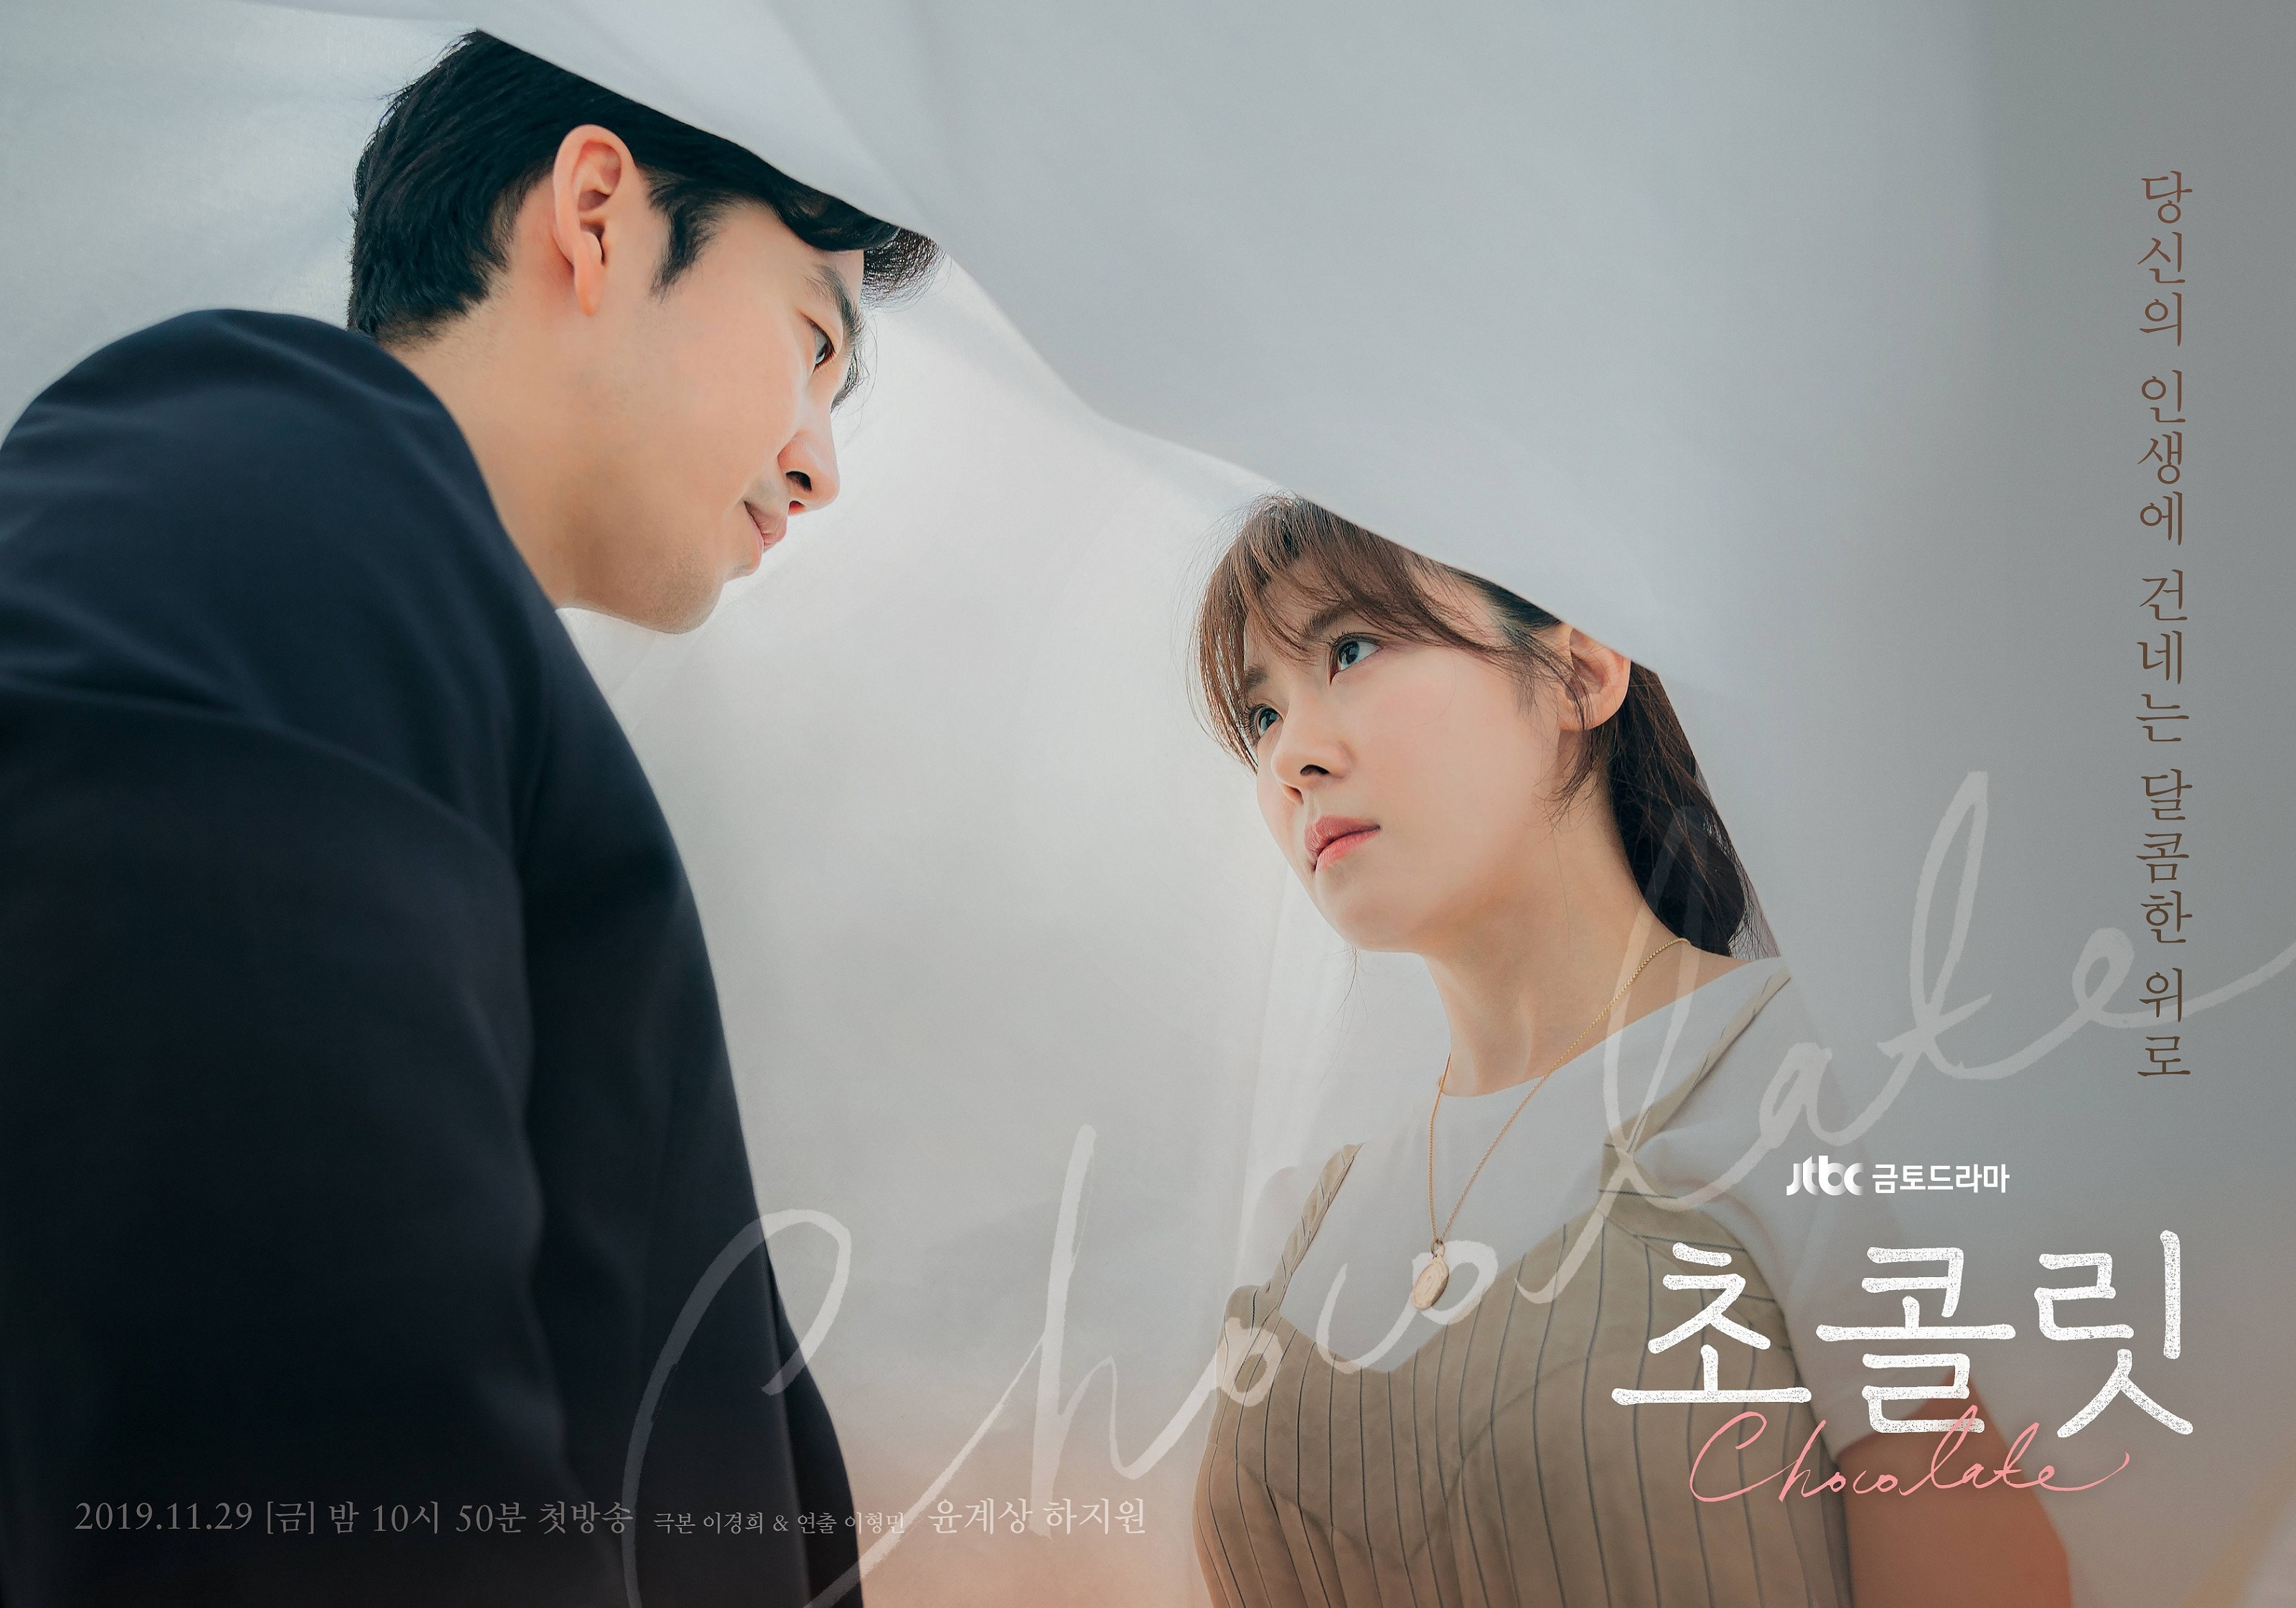 ha jiwon, drama ha jiwon chocolate, chocolate cast, chocolate summary, chocolate drama, chocolate jtbc